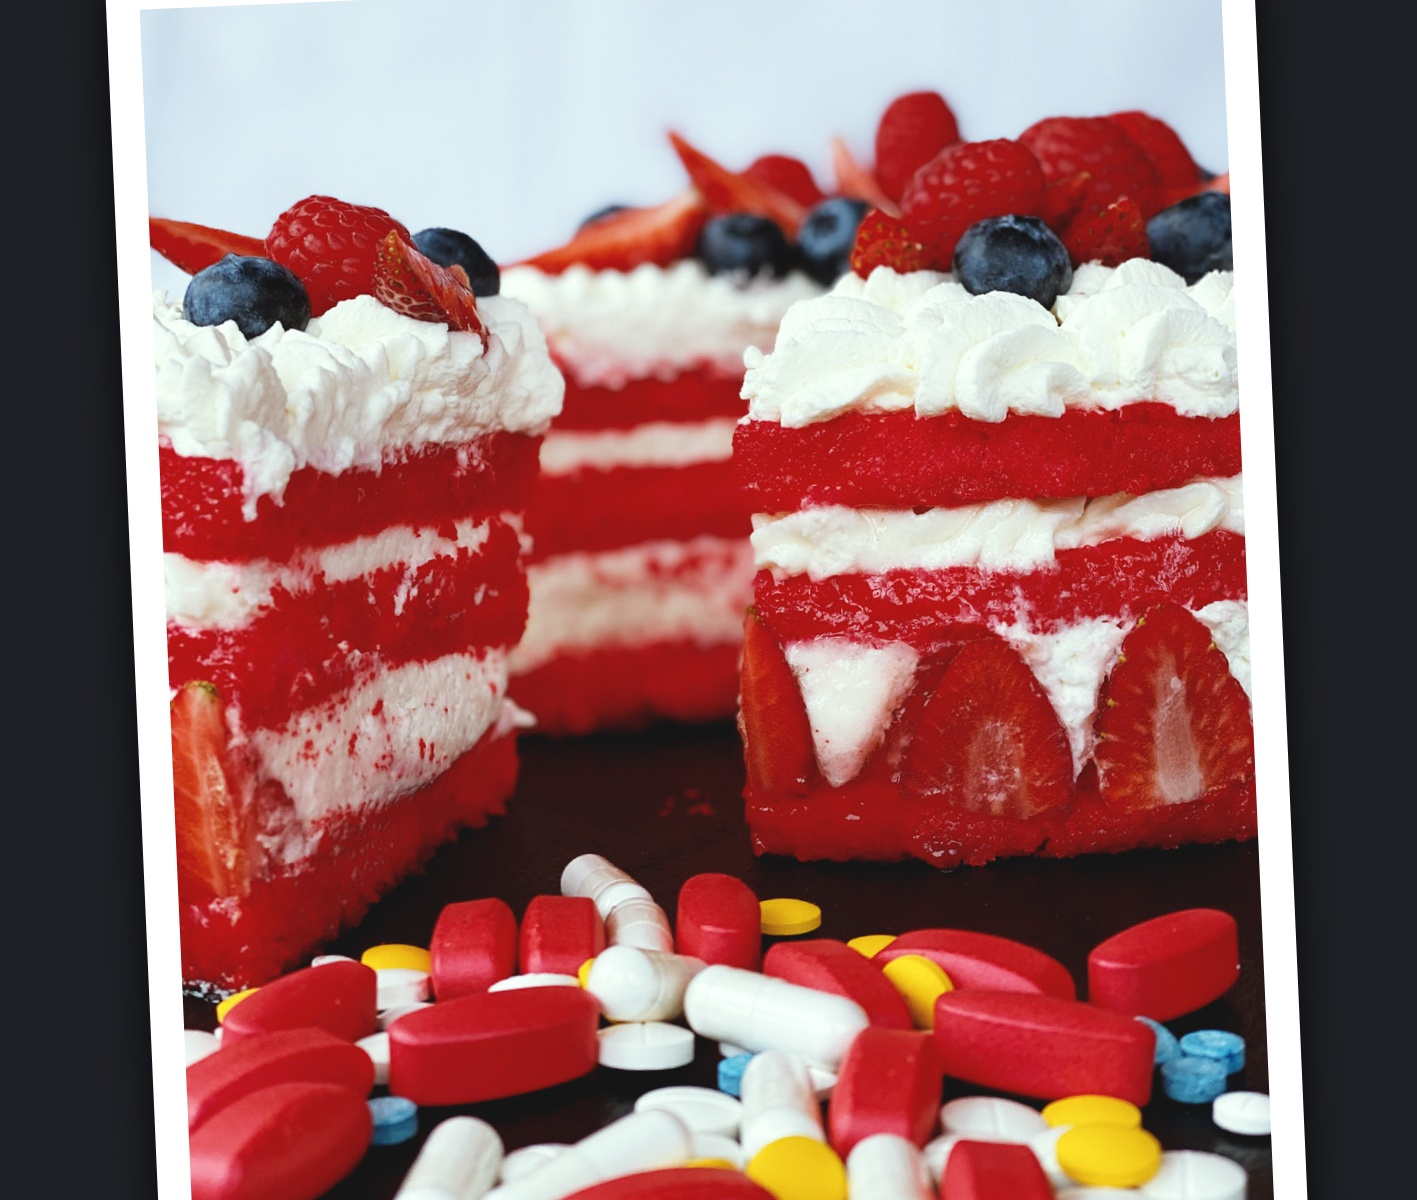 Die TorteRomana Ganzoni